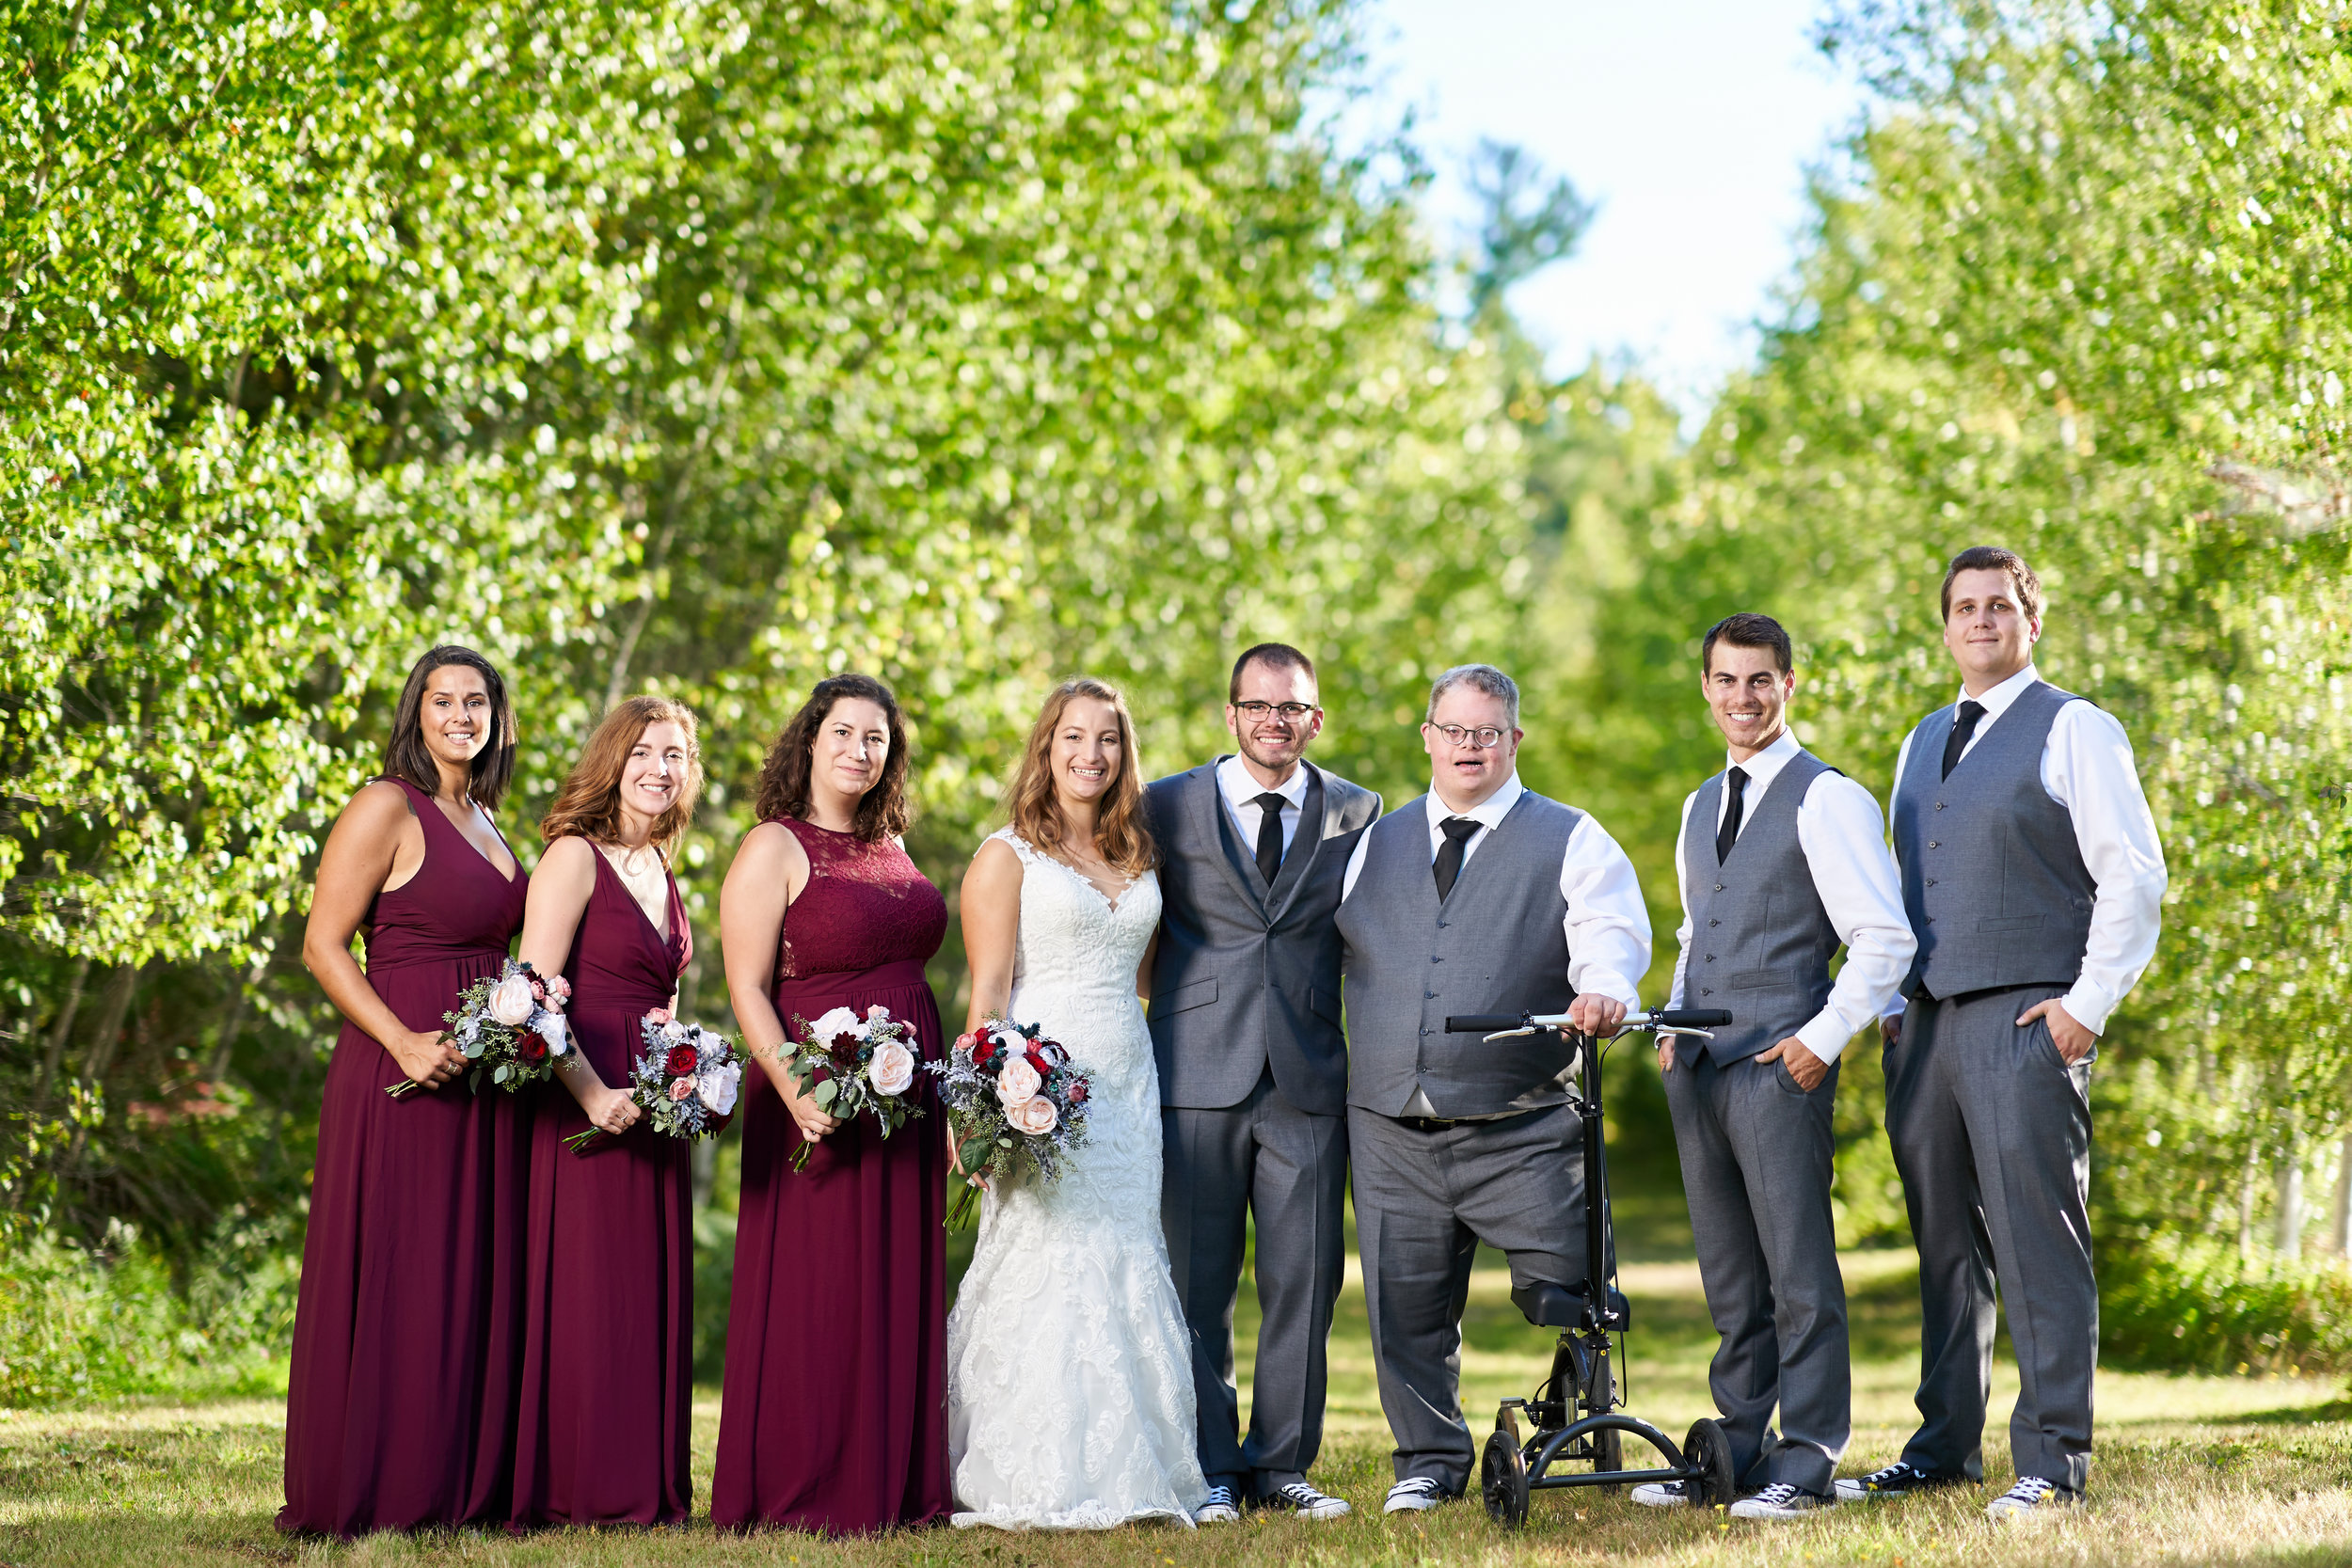 Arielle & Brad's Wedding - 508.jpg